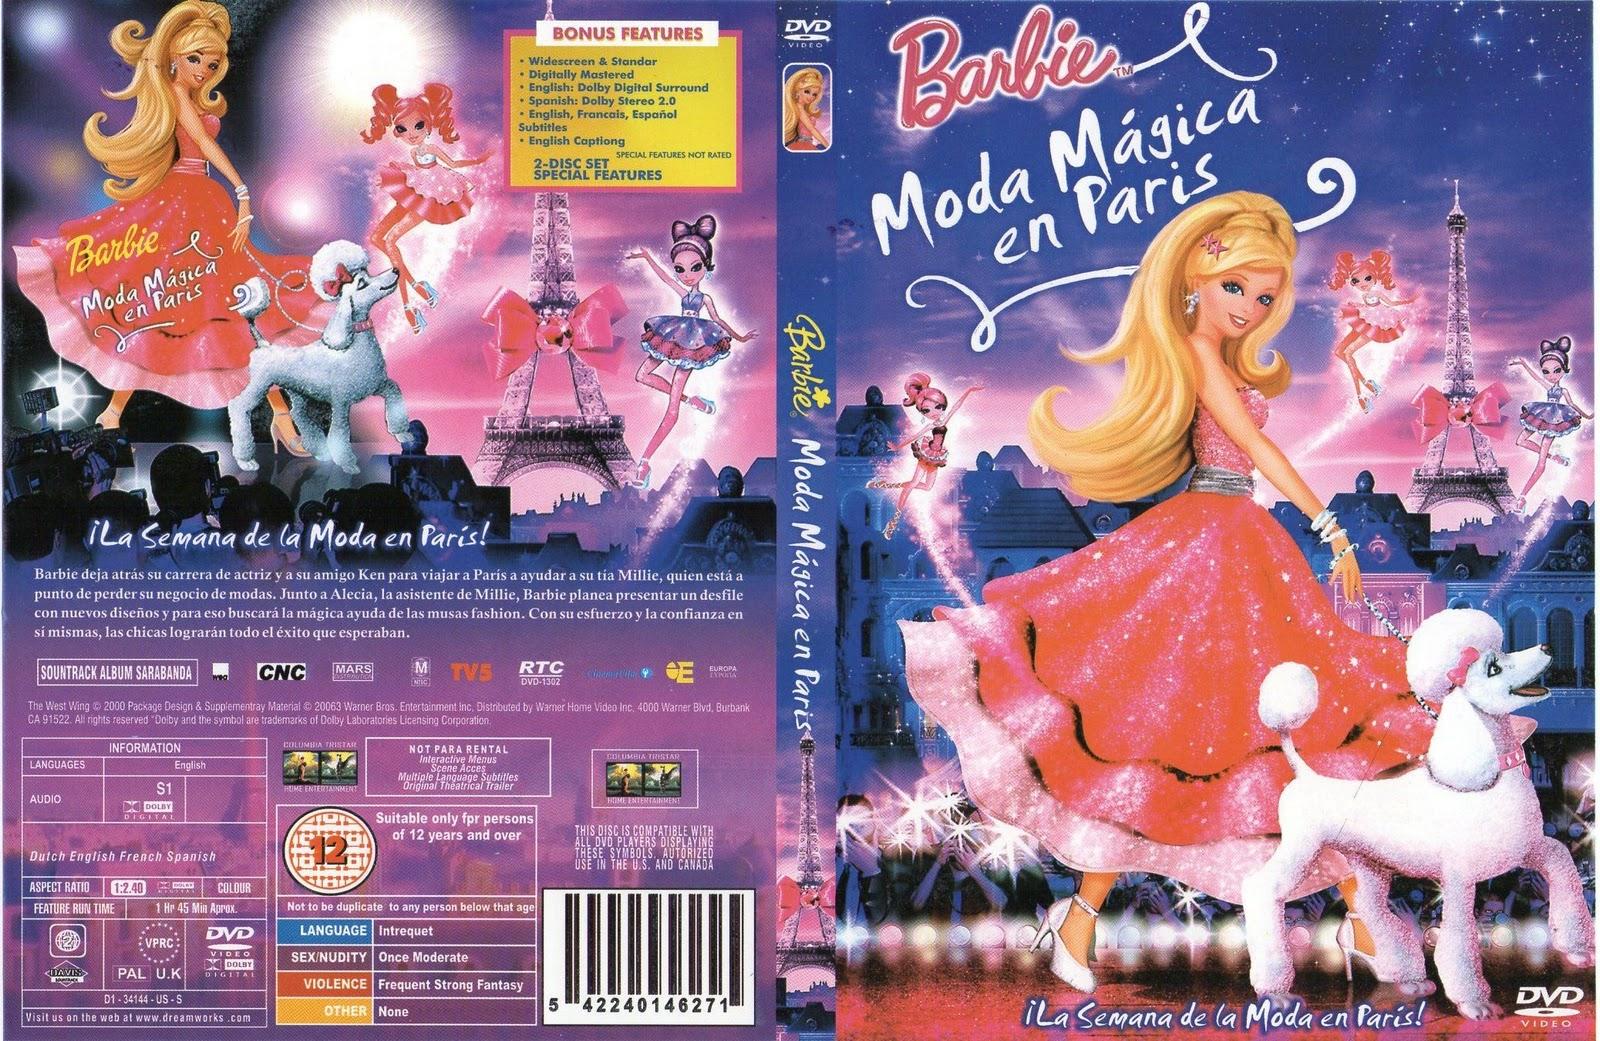 http://1.bp.blogspot.com/_IrbmmZfHTw0/TL2pvkr6mVI/AAAAAAAABTU/_eGMlBBdFys/s1600/(+6069+)++Barbie+(+Moda+Magica+En+Paris+)+(+Fashion+Fairytale+).jpg